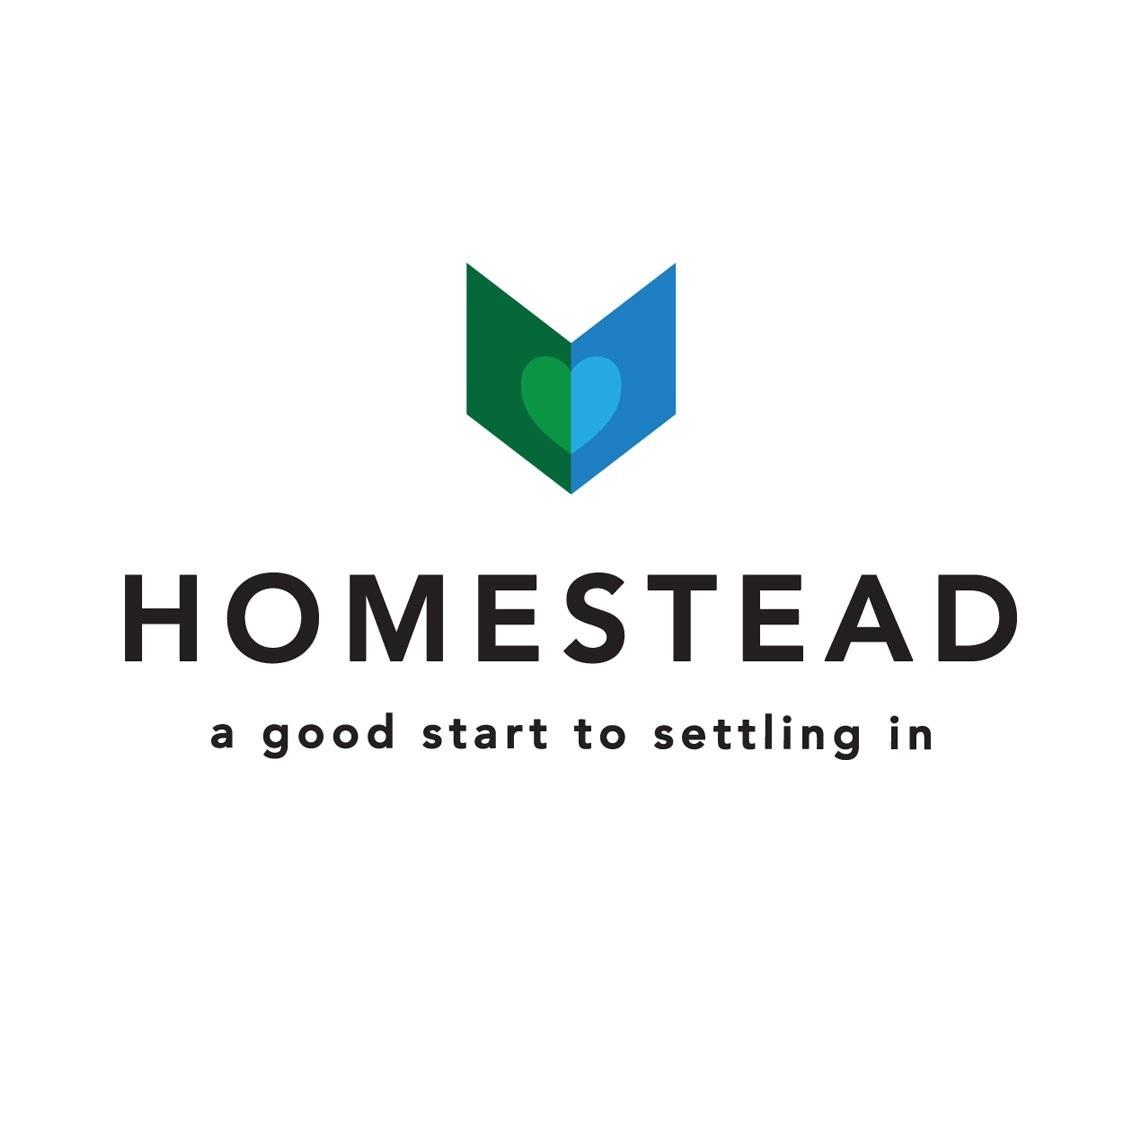 Homestead IVS